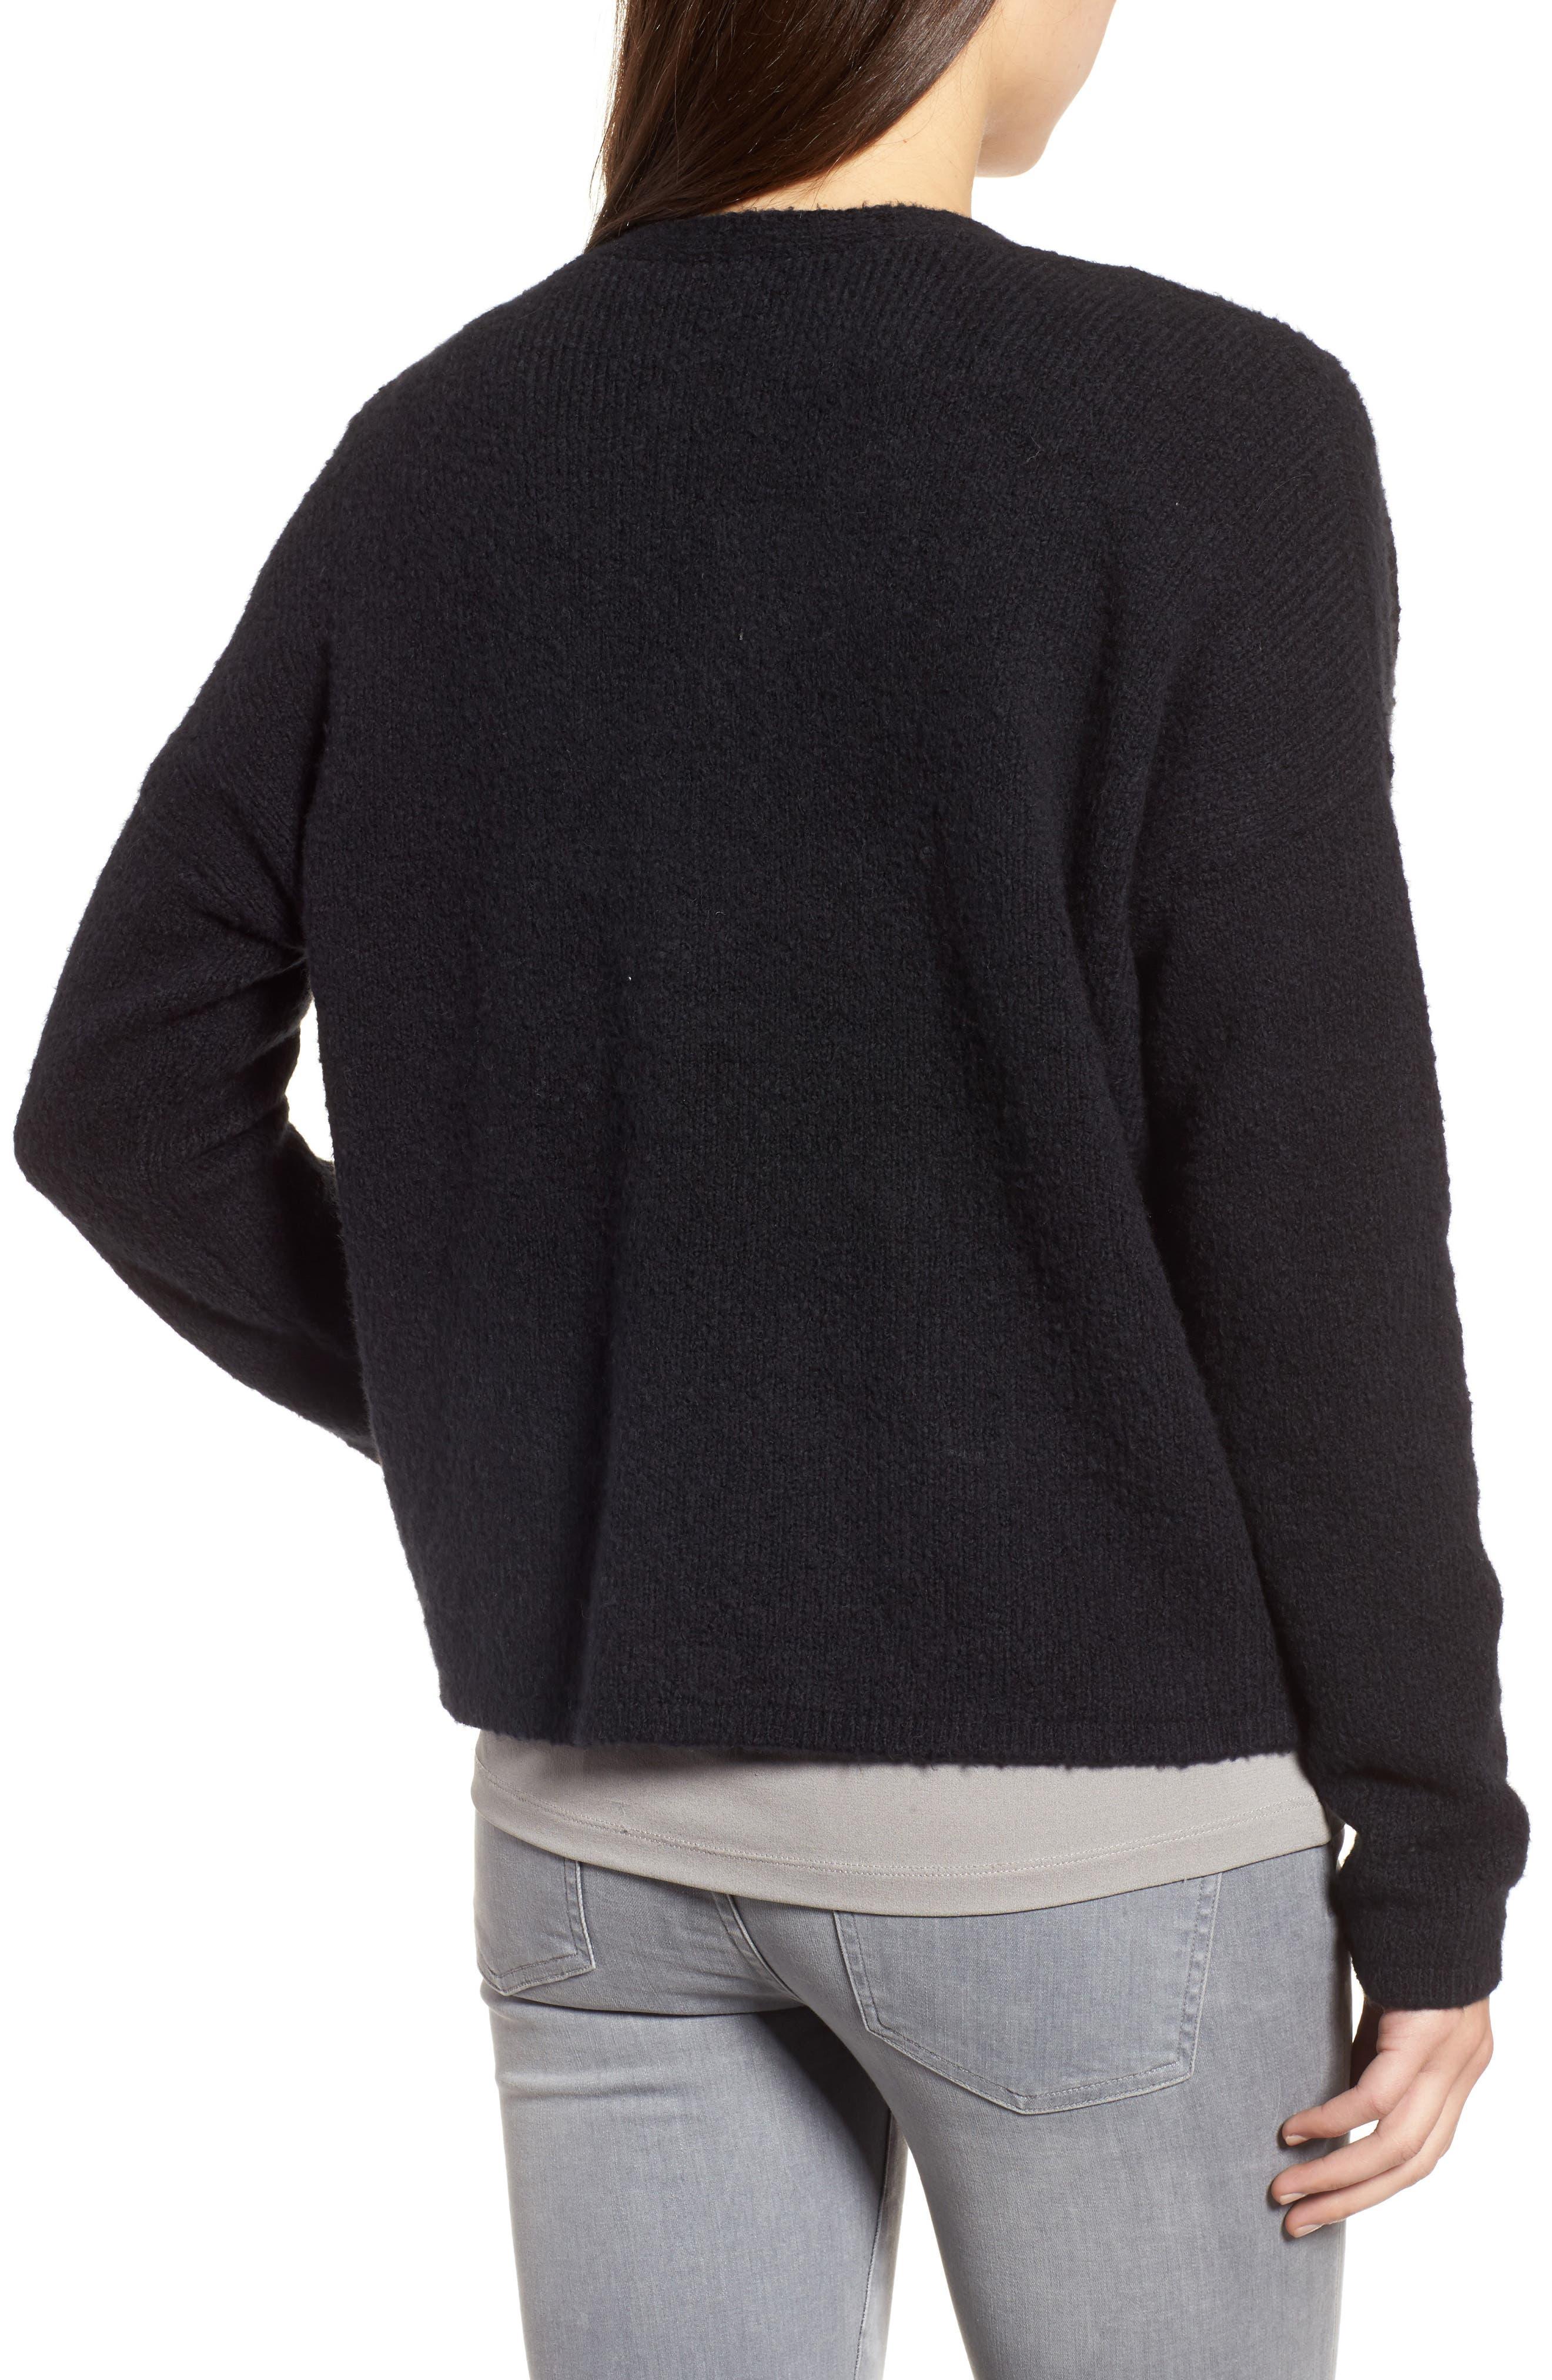 Organic Cotton Blend Cardigan,                             Alternate thumbnail 2, color,                             Black